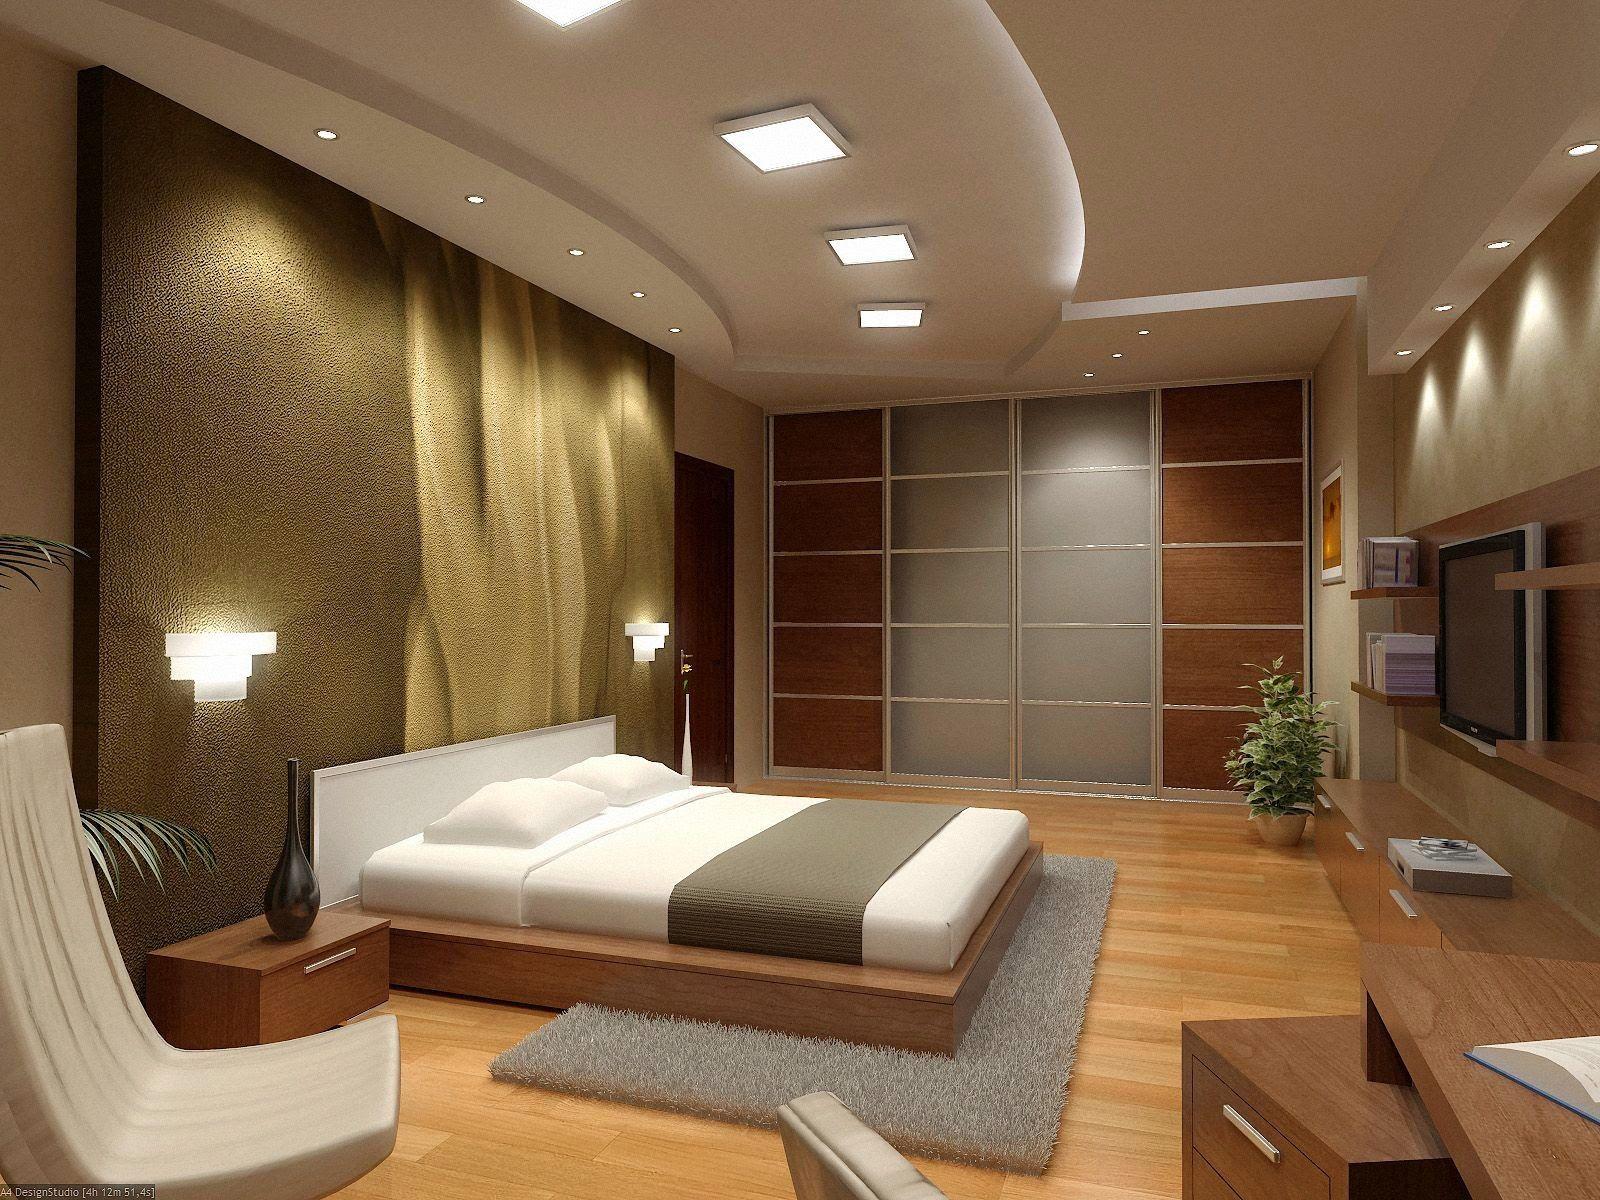 Firma De Contructii Amenajari Spatiicentre Comerciale Renovari Simple Bedroom Designer Online Free Decorating Inspiration